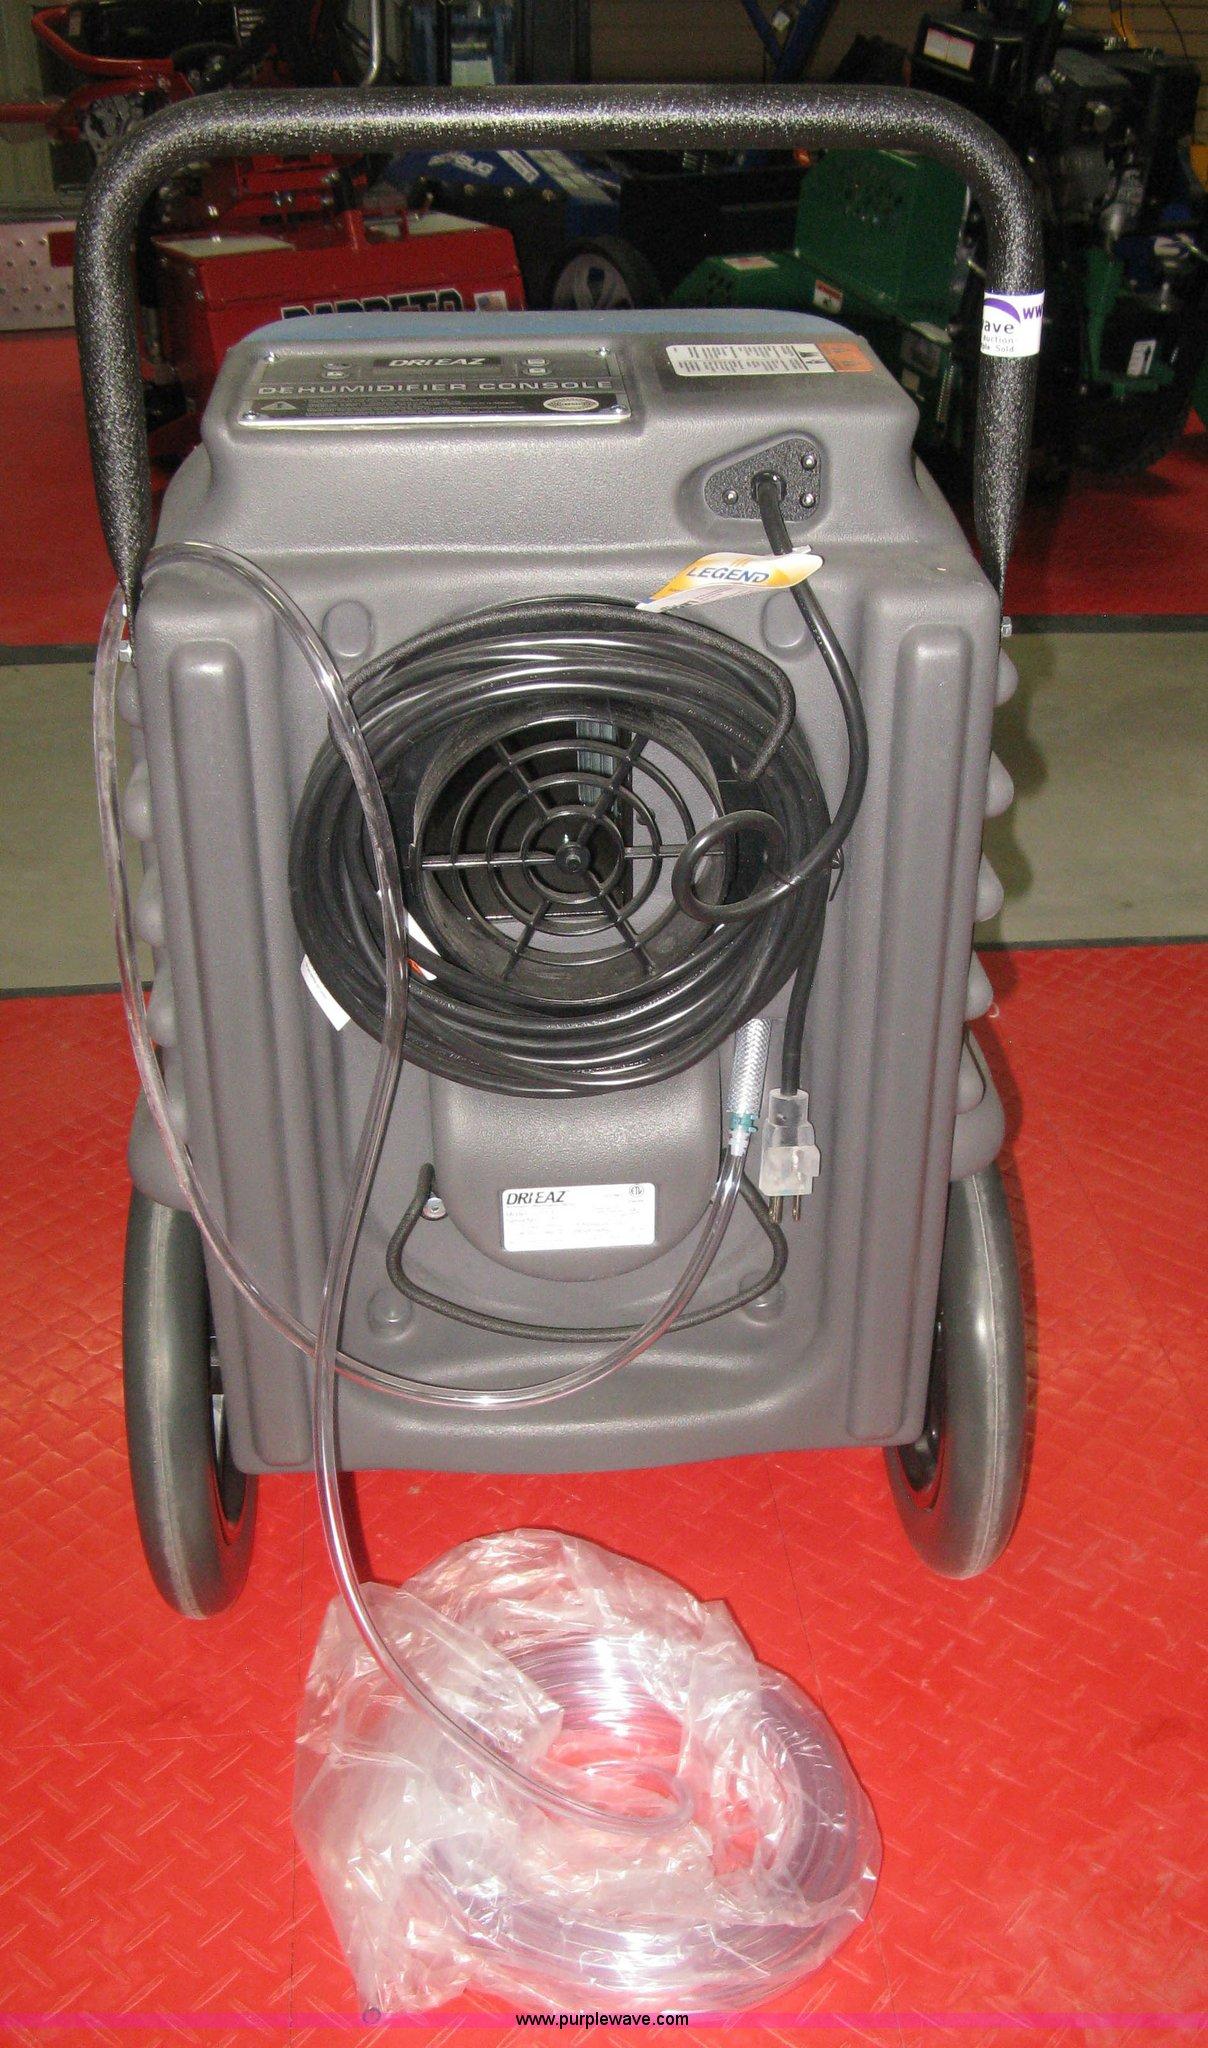 Dri-Eaz Drizair 1200 F203-A dehumidifier | Item BP9744 | SOL